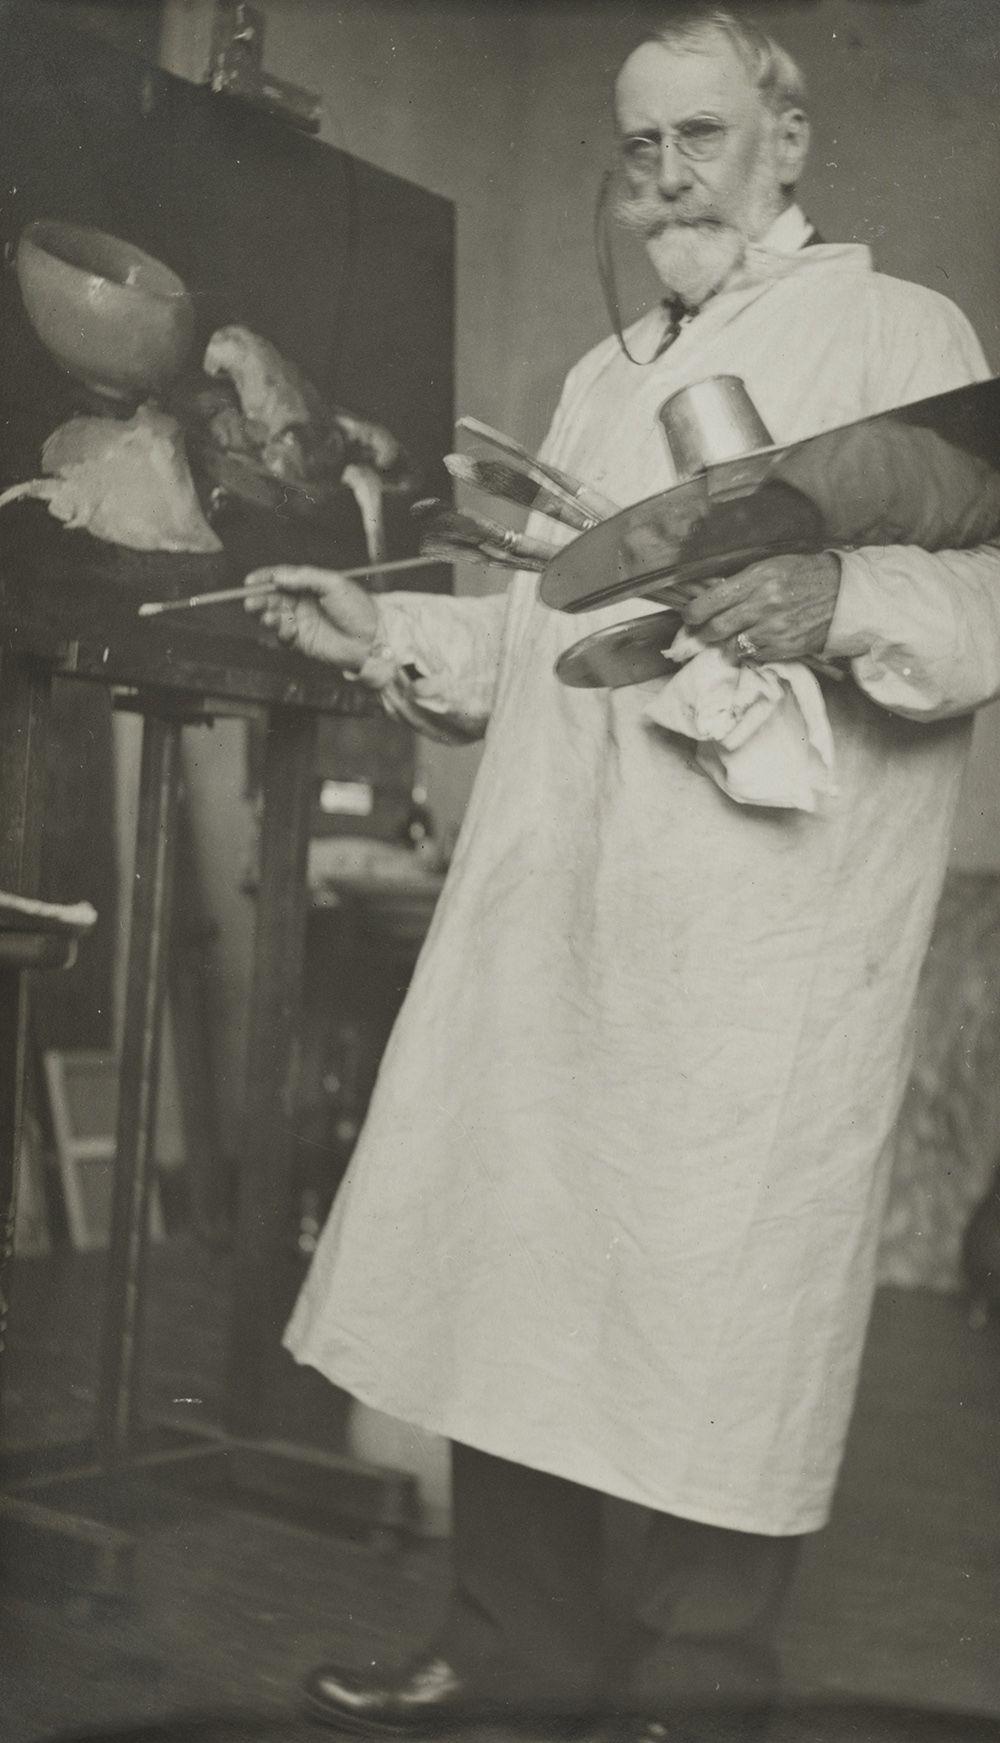 Photograph of William Merritt Chase painting in his studio.